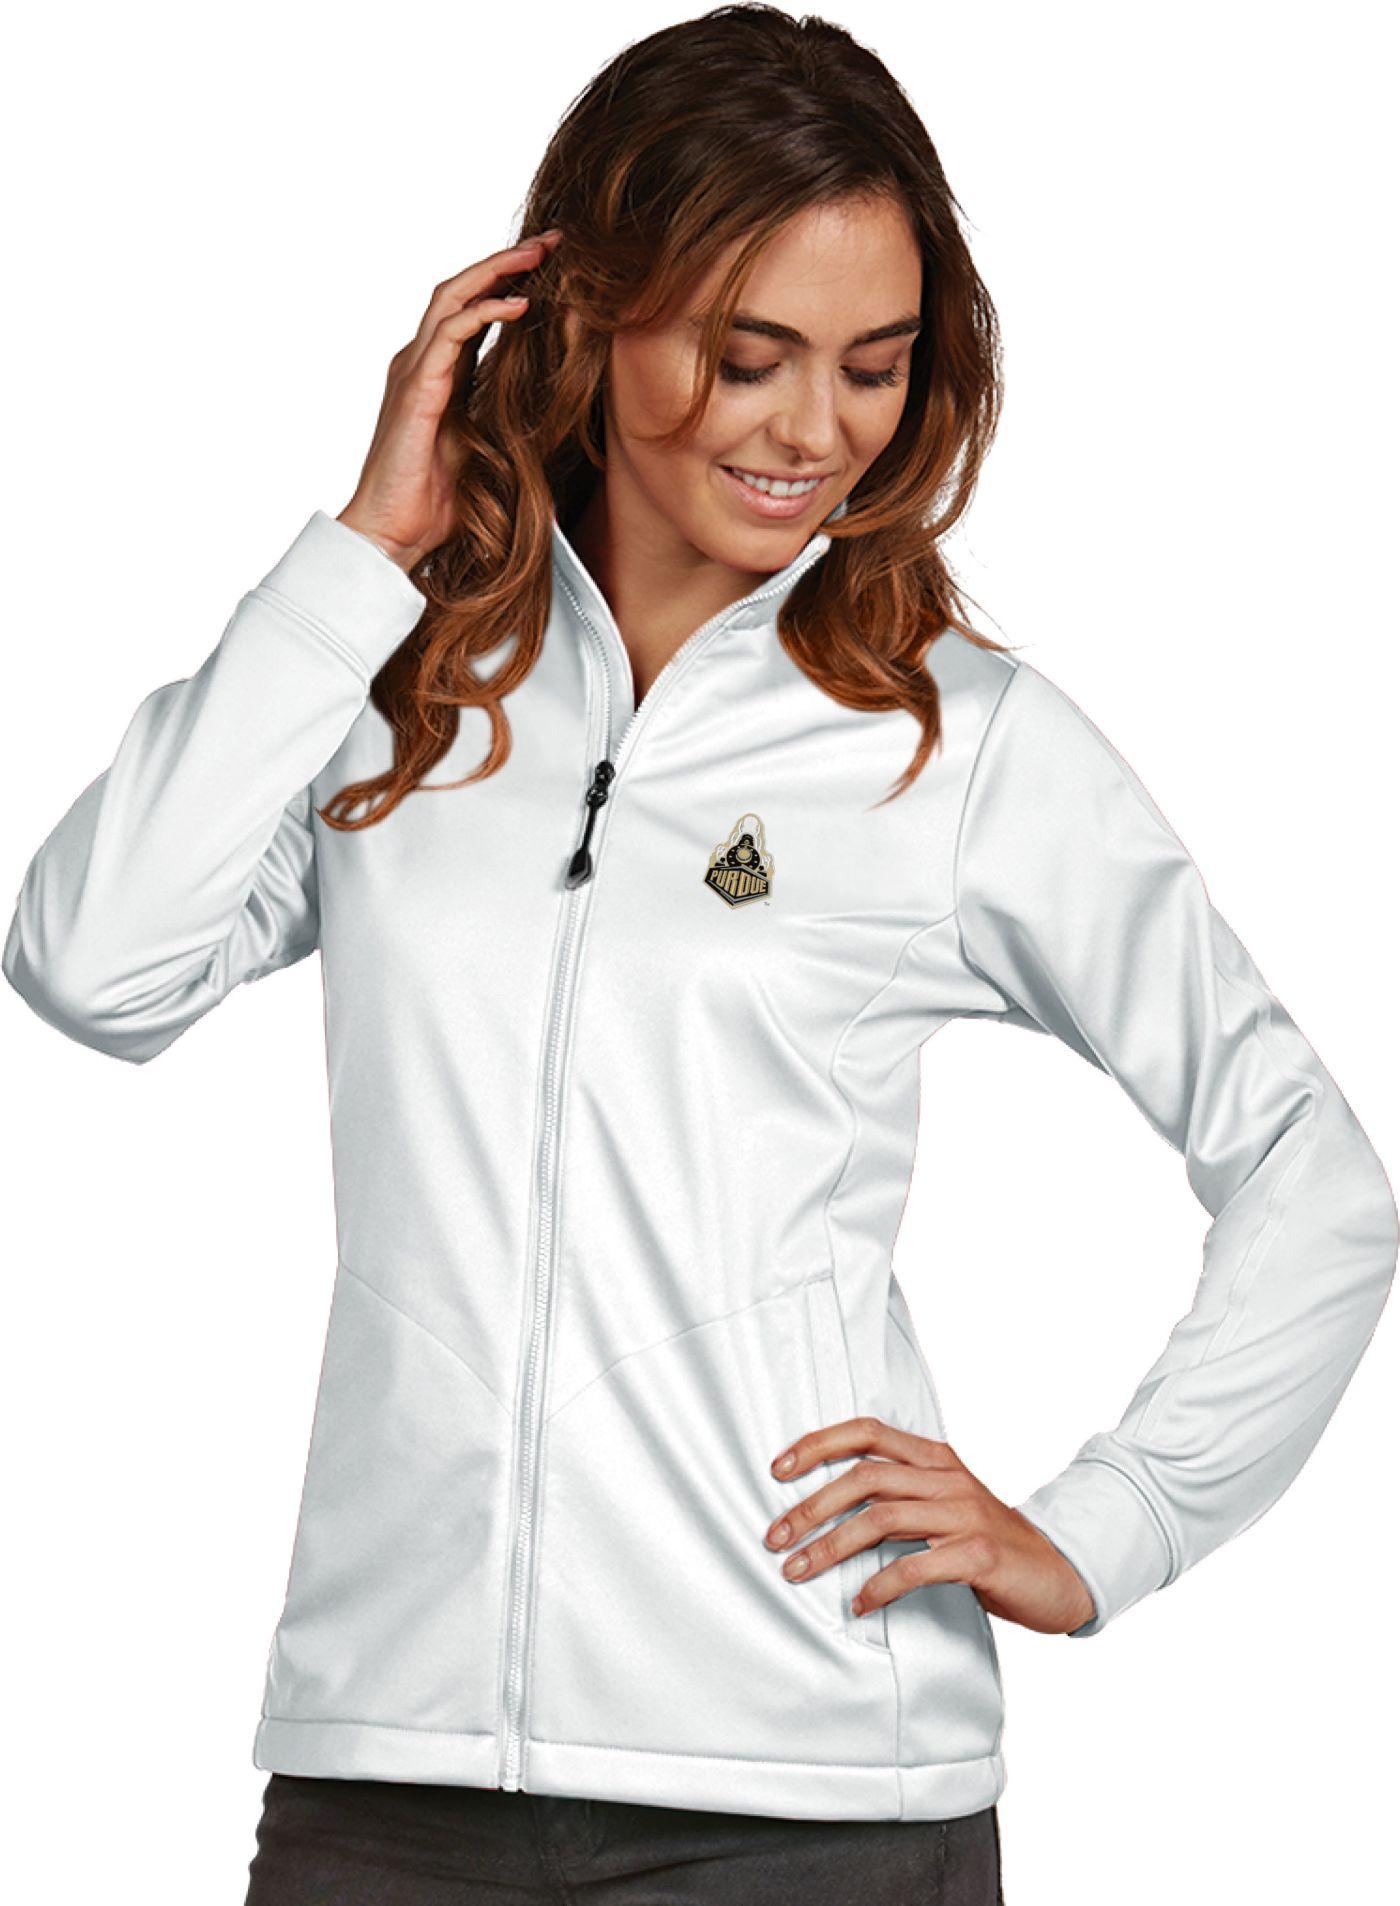 Antigua Women's Purdue Boilermakers White Performance Golf Jacket